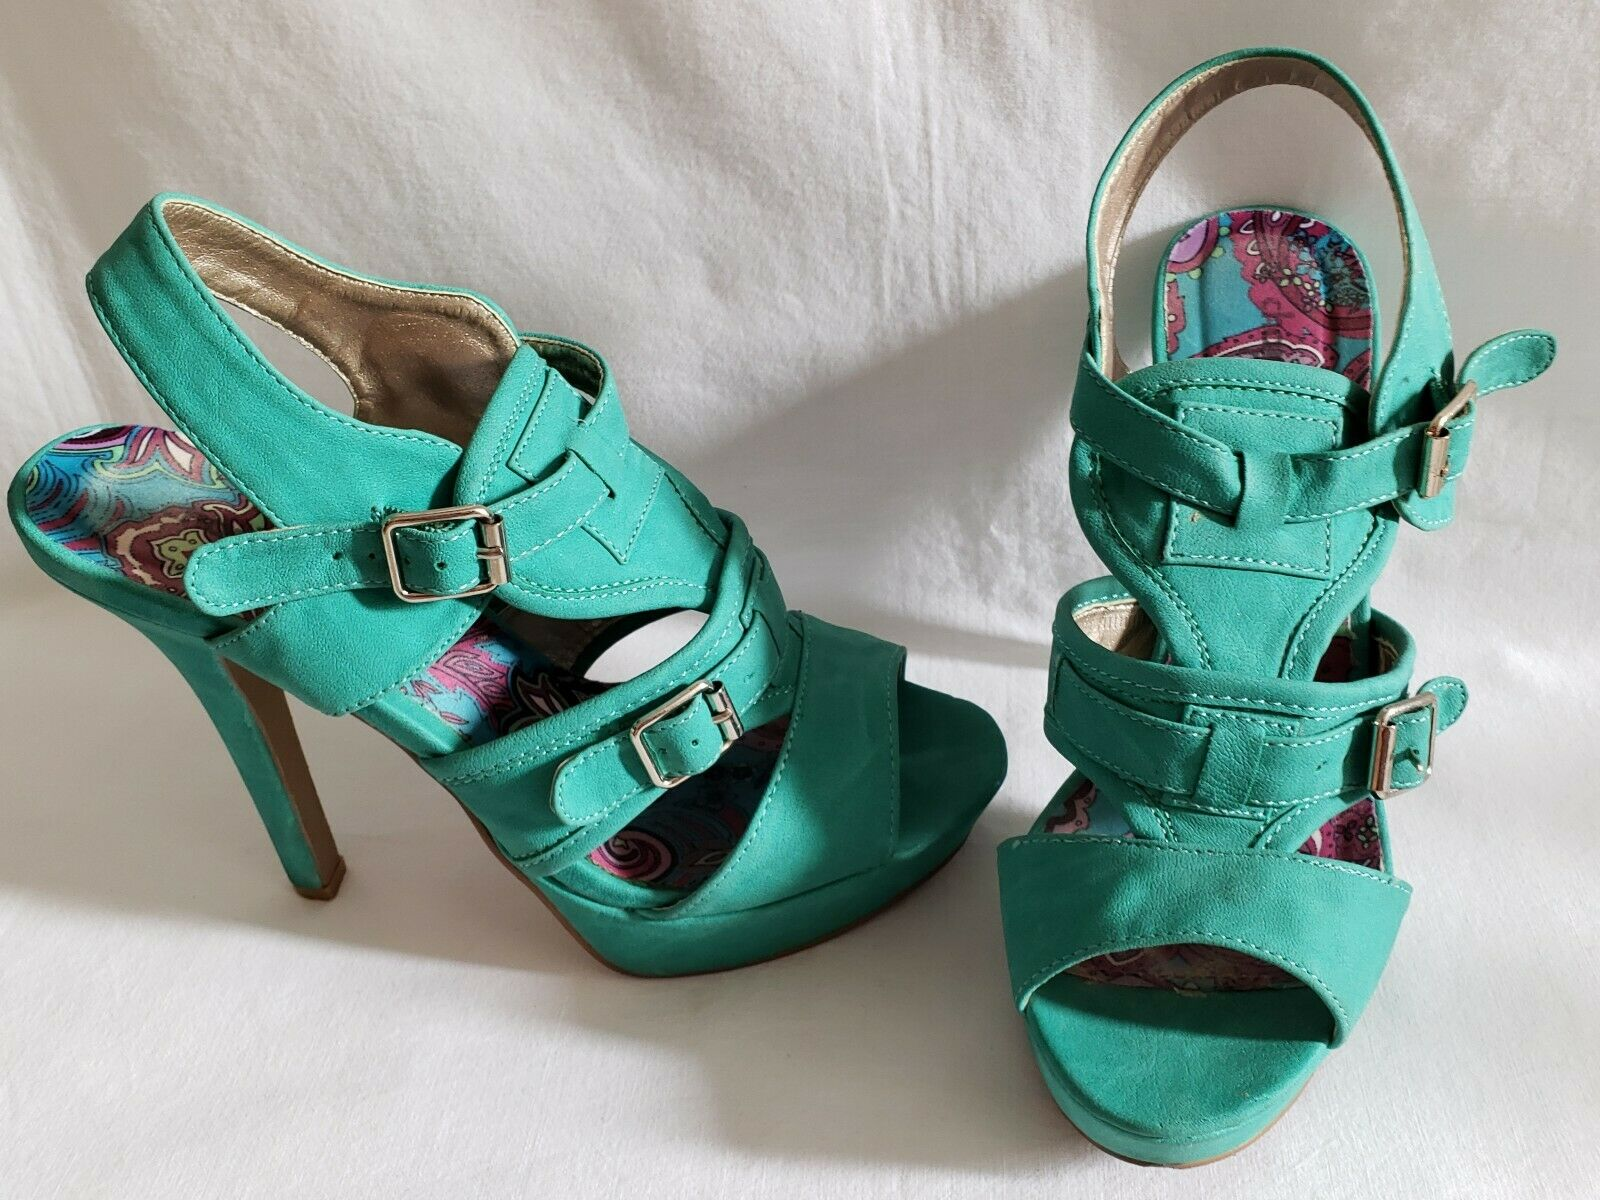 Womens charlotte russe brand turquoise/real slim high heel stiletto pumps sz 8